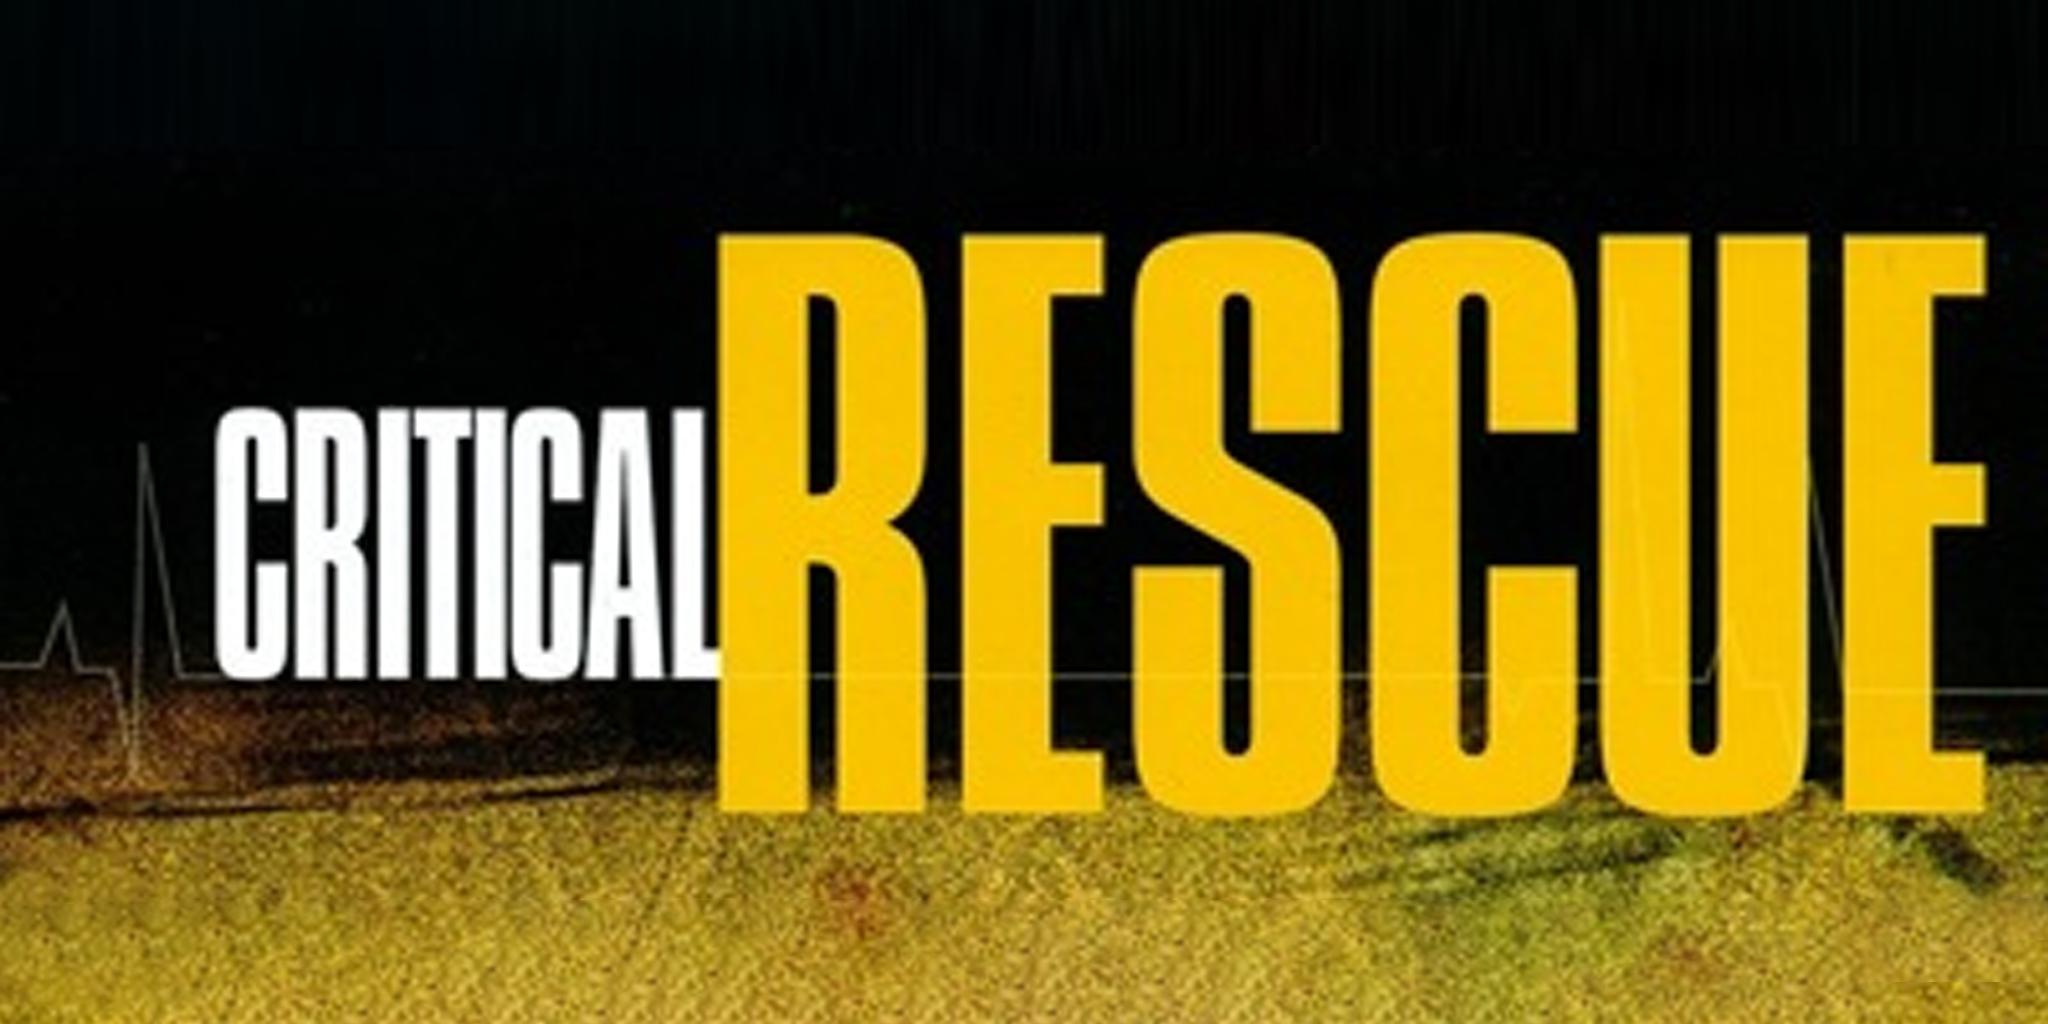 Critical Rescue [TV Series]